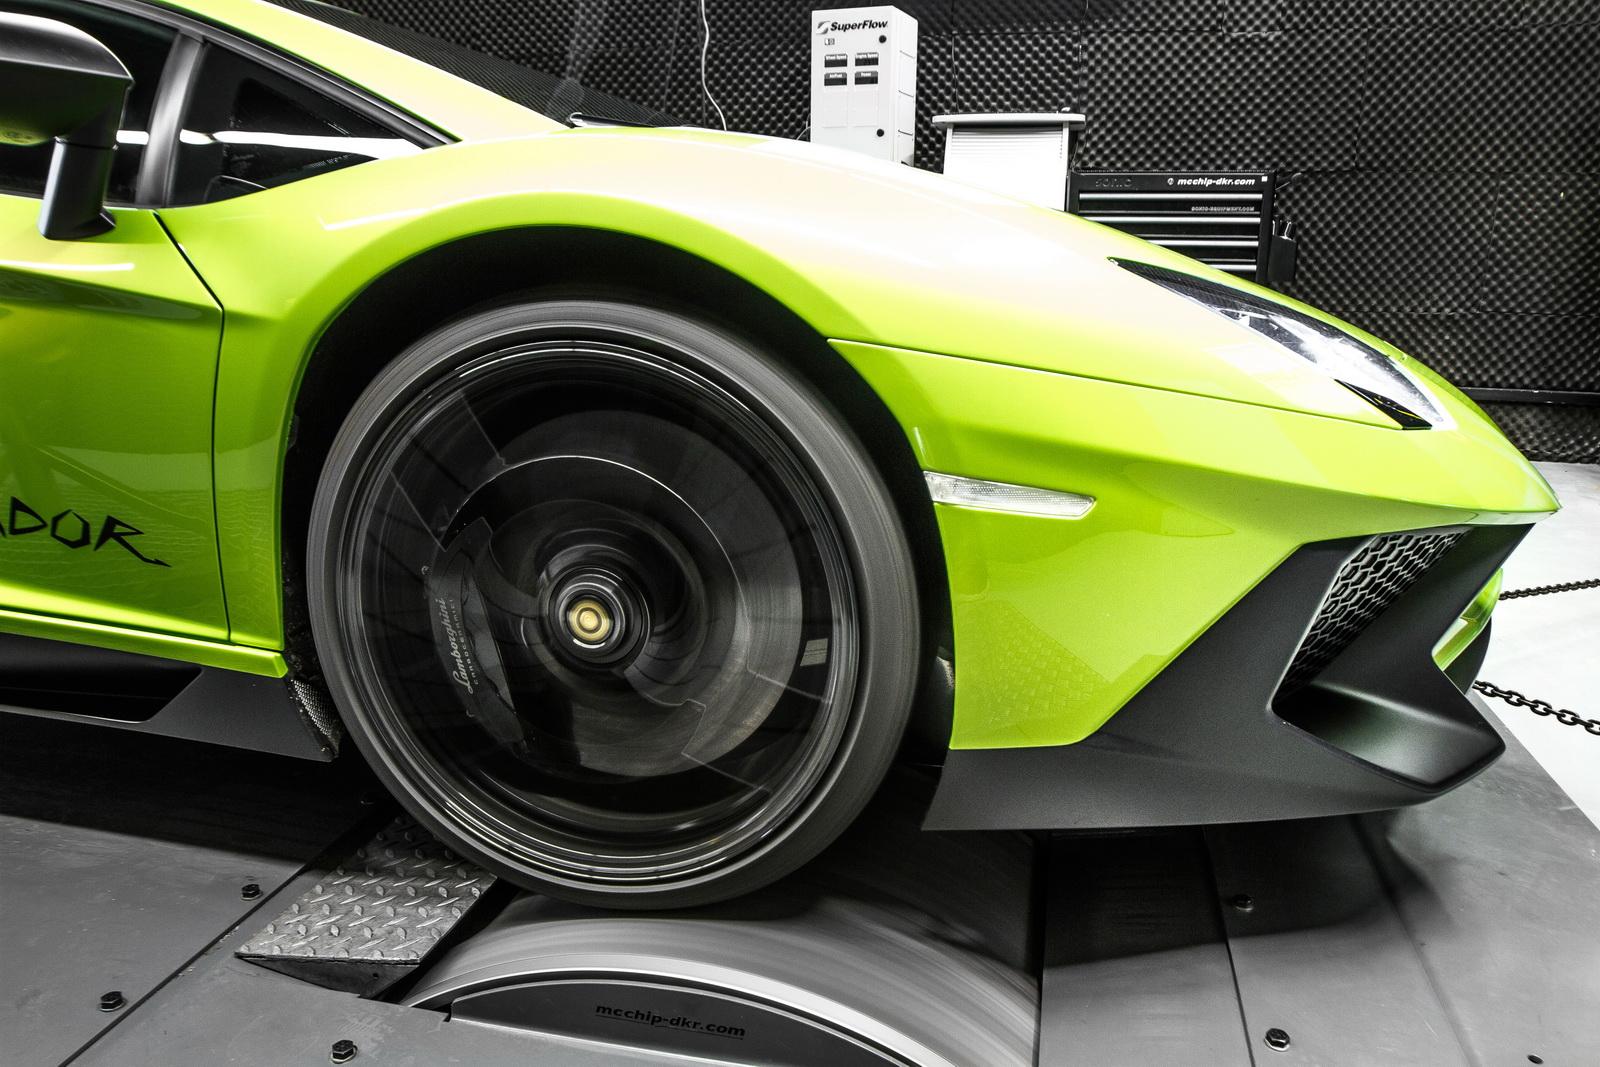 Lamborghini_Aventador_SV_by_Mcchip-DKR_19